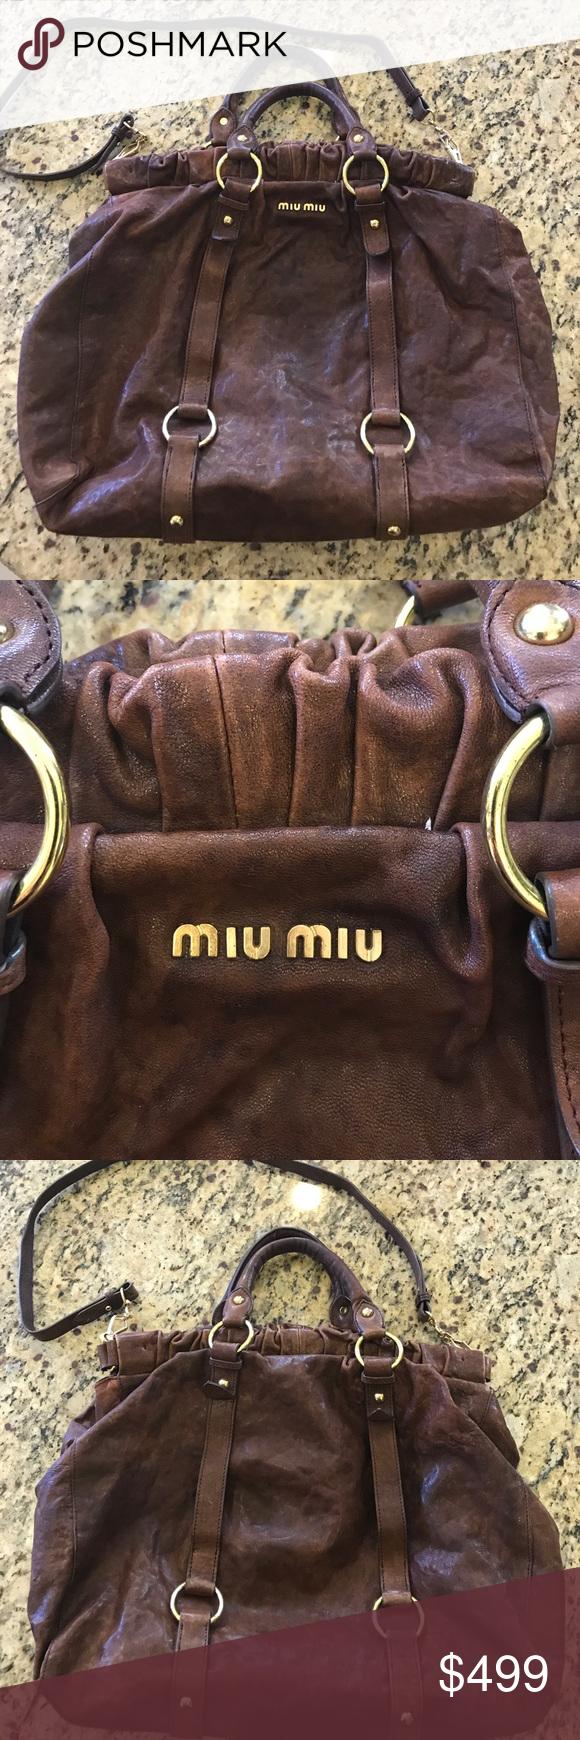 f411447b0 Auth Miu Miu Distressed Leather Crossbody Hobo Bag Auth Miu Miu Distressed  Leather Crossbody Hobo Bag. Large tote Handbag with detachable shoulder  strap ...